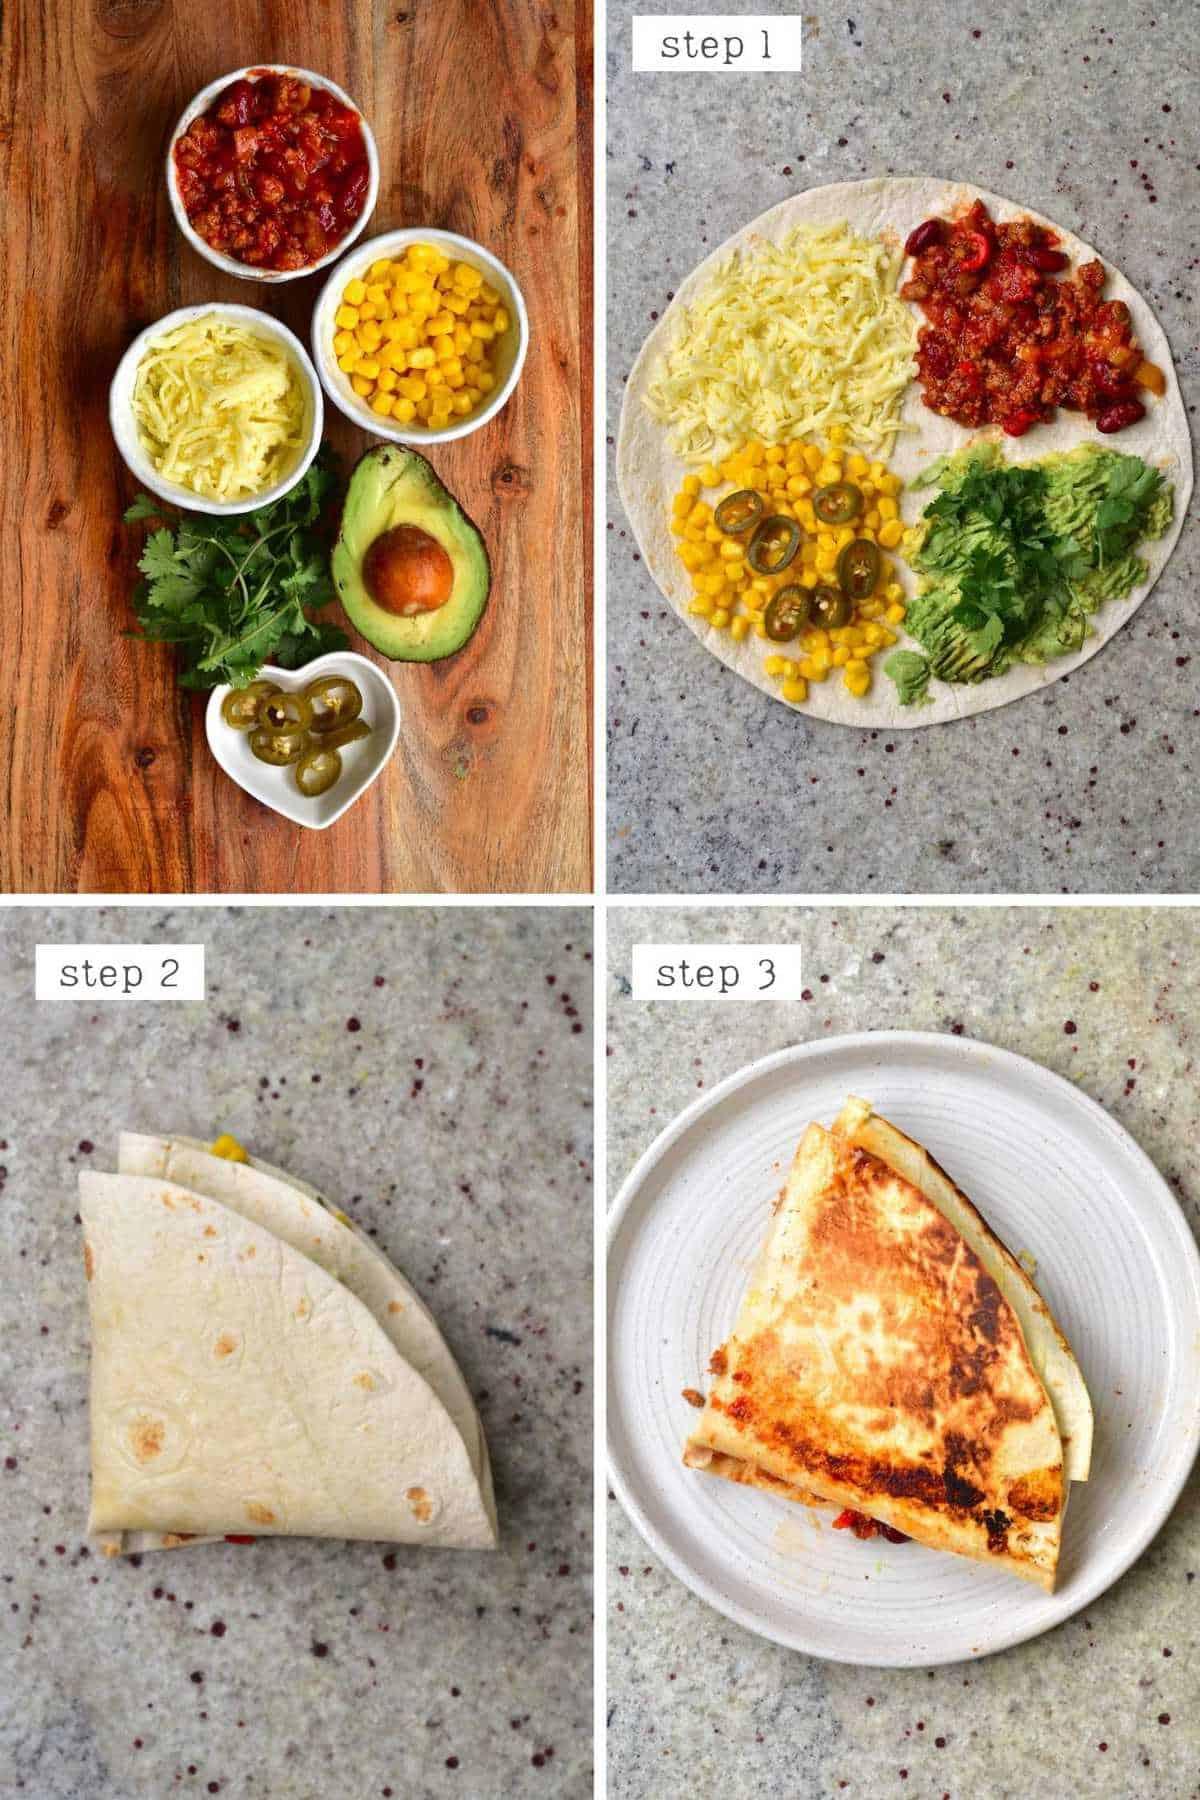 Steps for making vegan chili con carne tortilla